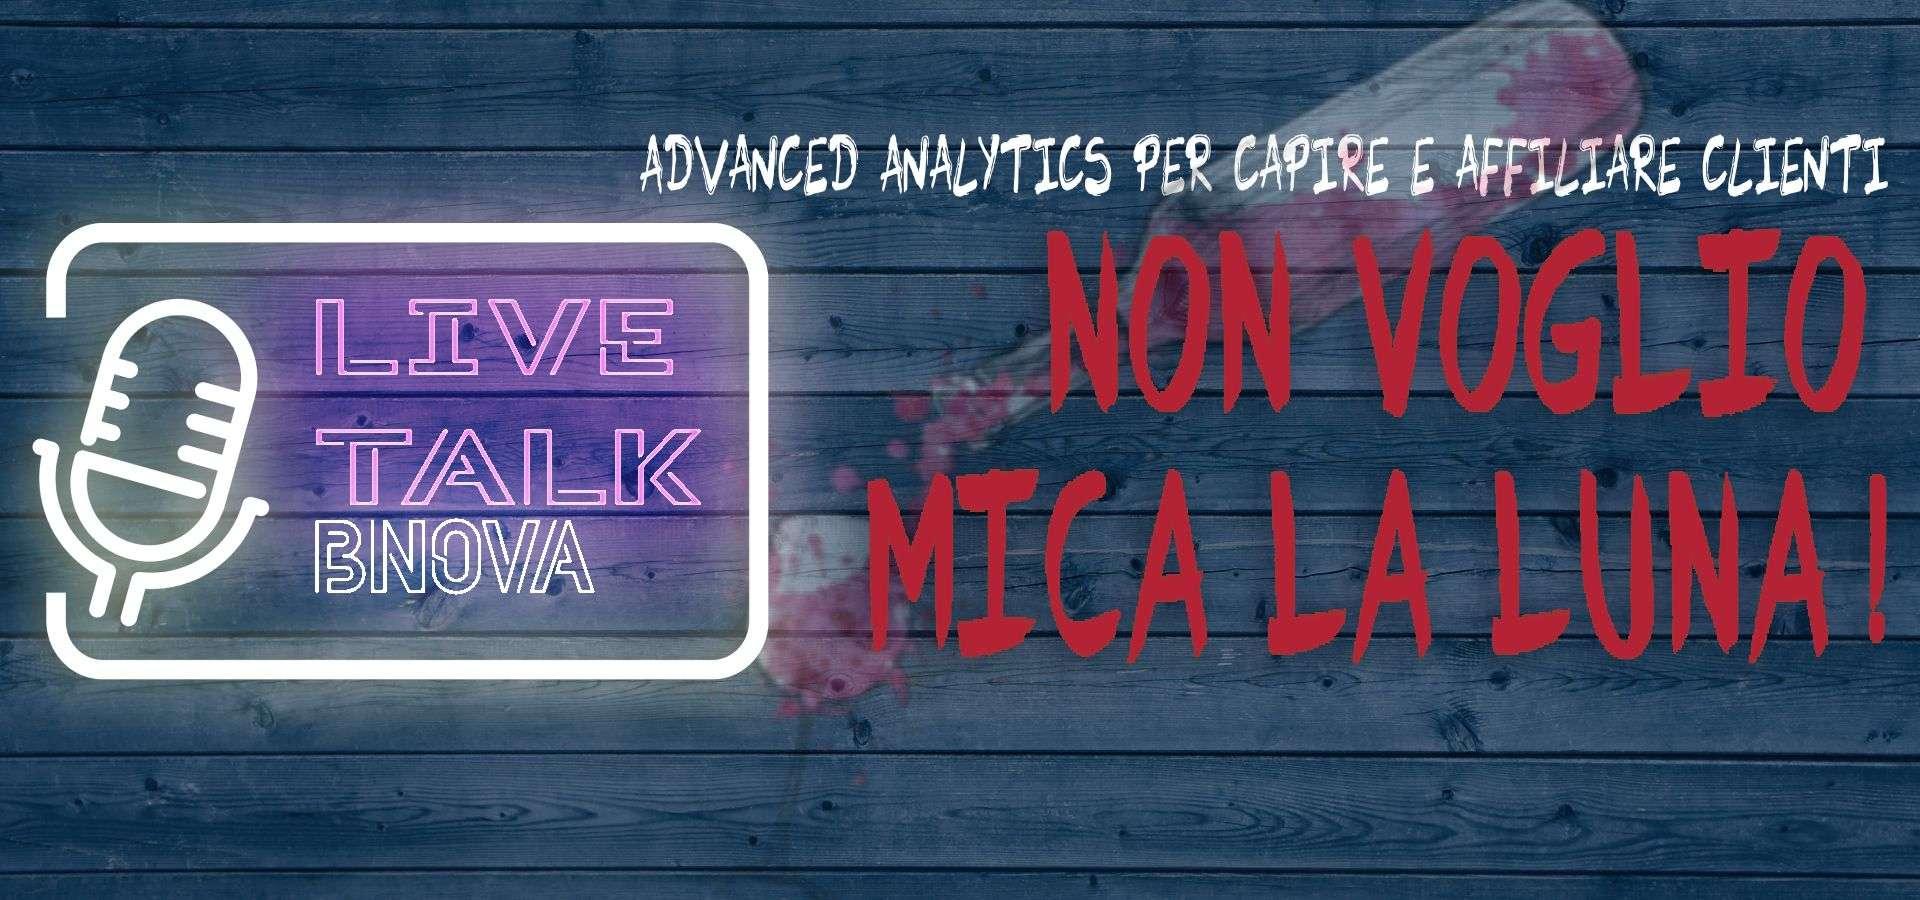 bnova webinar big data analysis download area